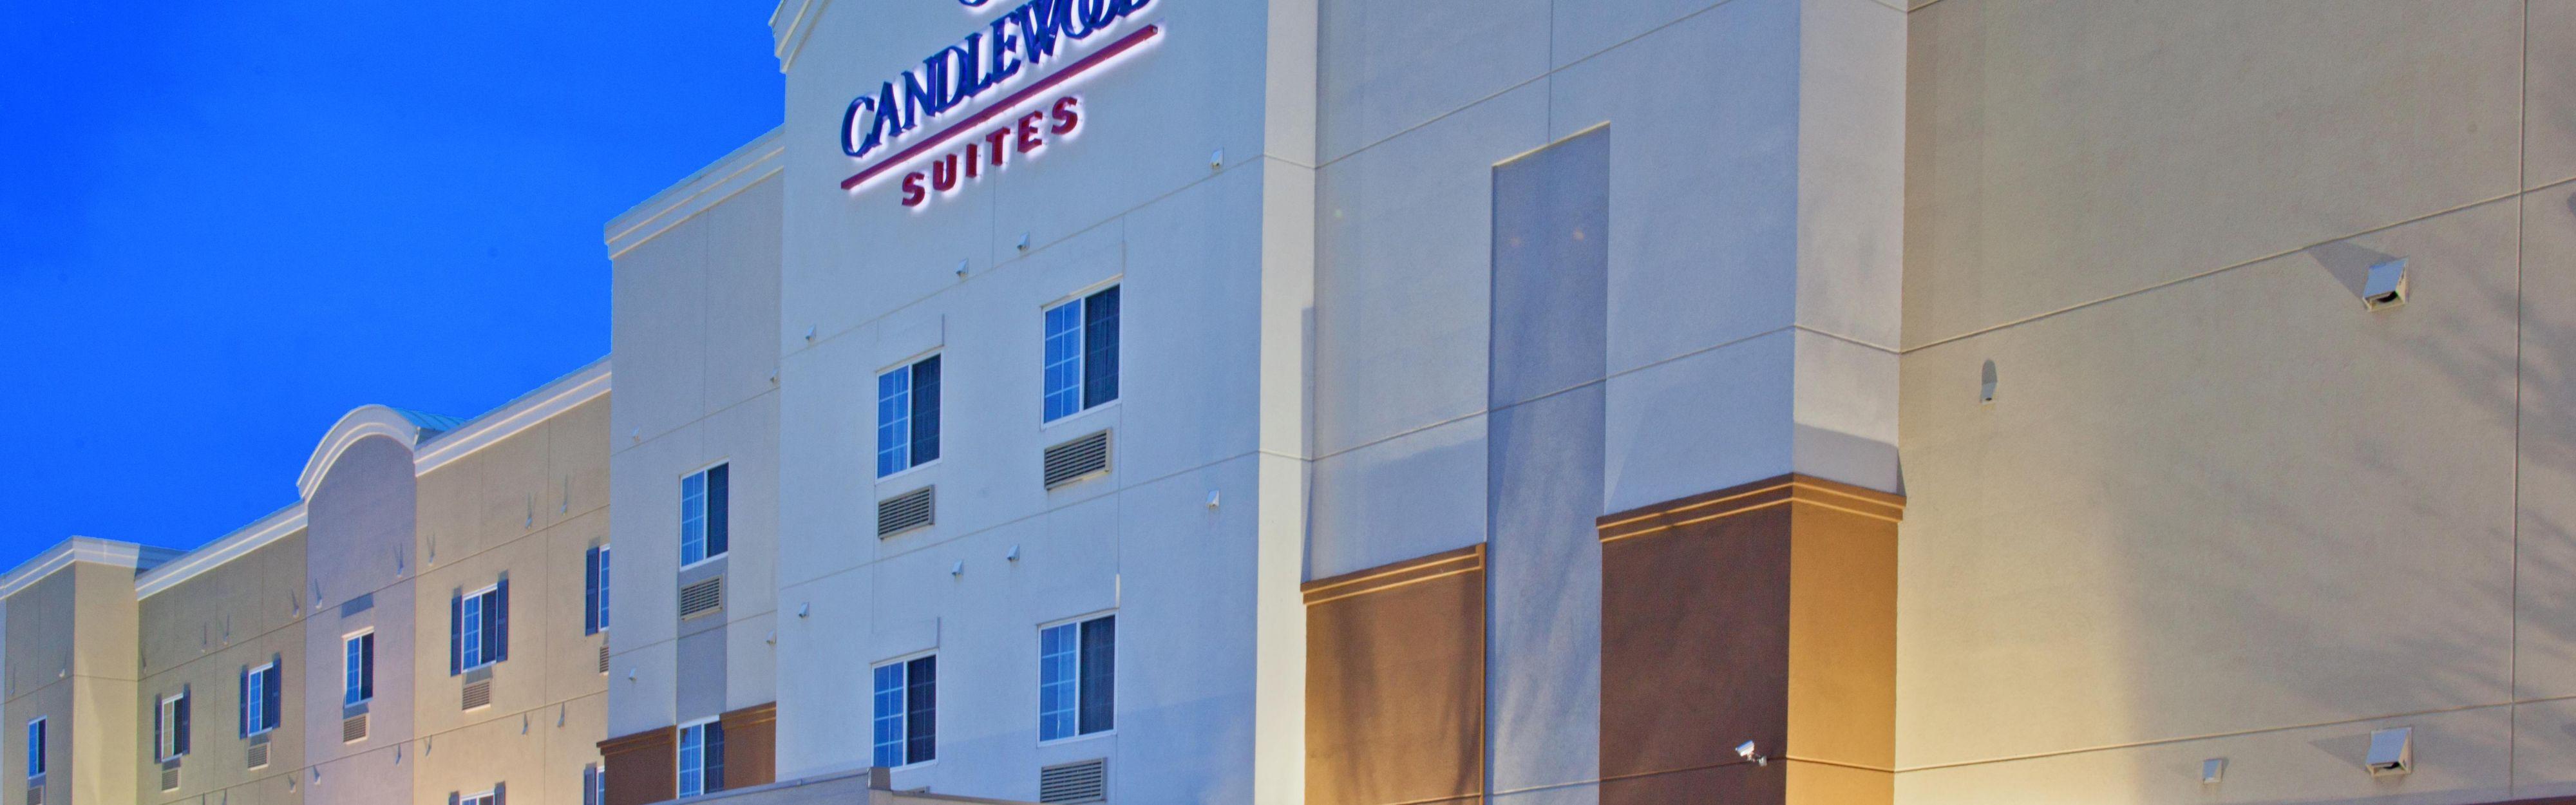 Candlewood Suites Houston Iah / Beltway 8 image 0